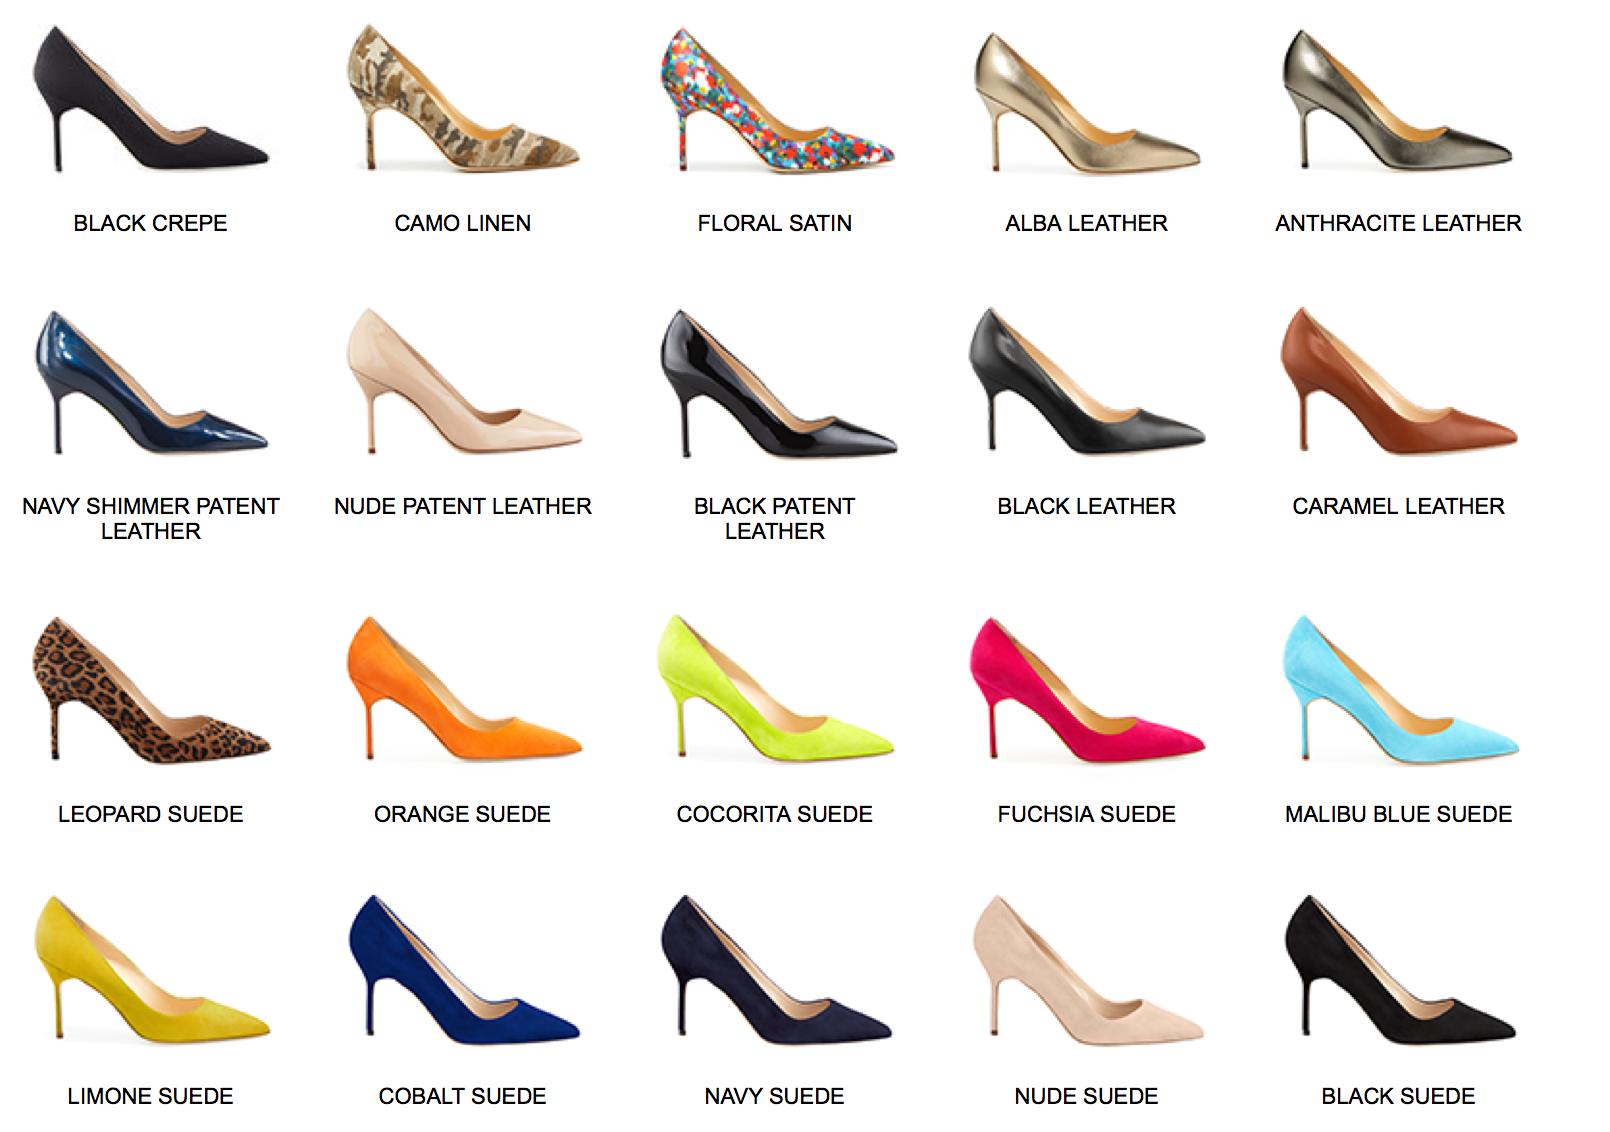 manolo blahnik shoes price list